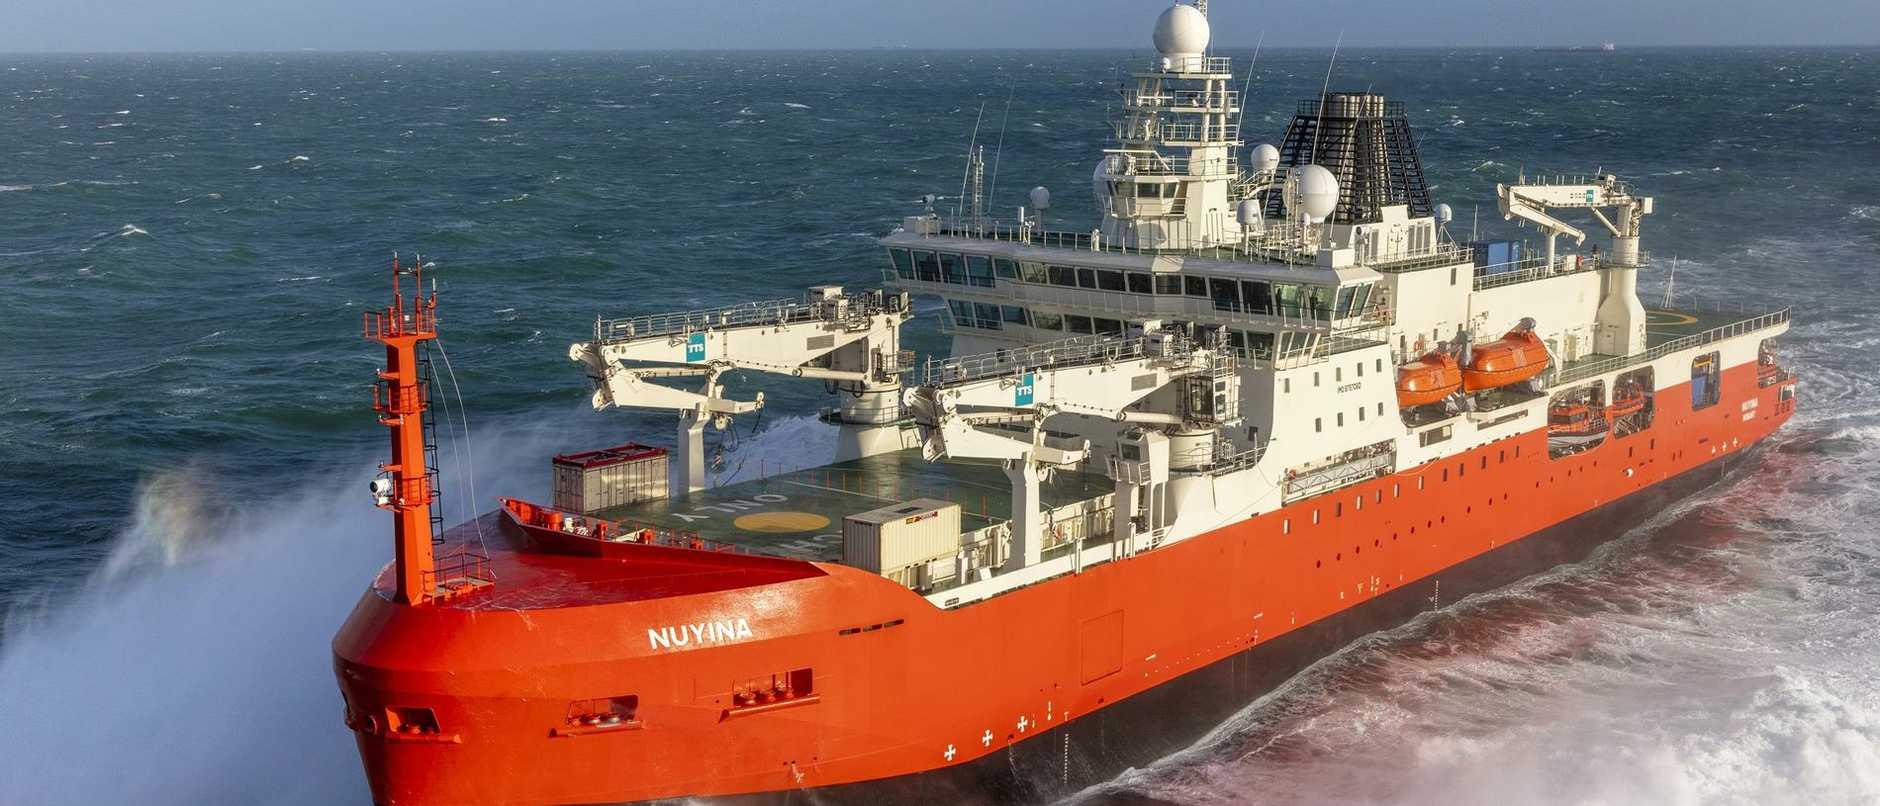 Australia's new Antarctic icebreaker RSV Nuyina is undertaking sea trails as it prepares to call Hobart home.